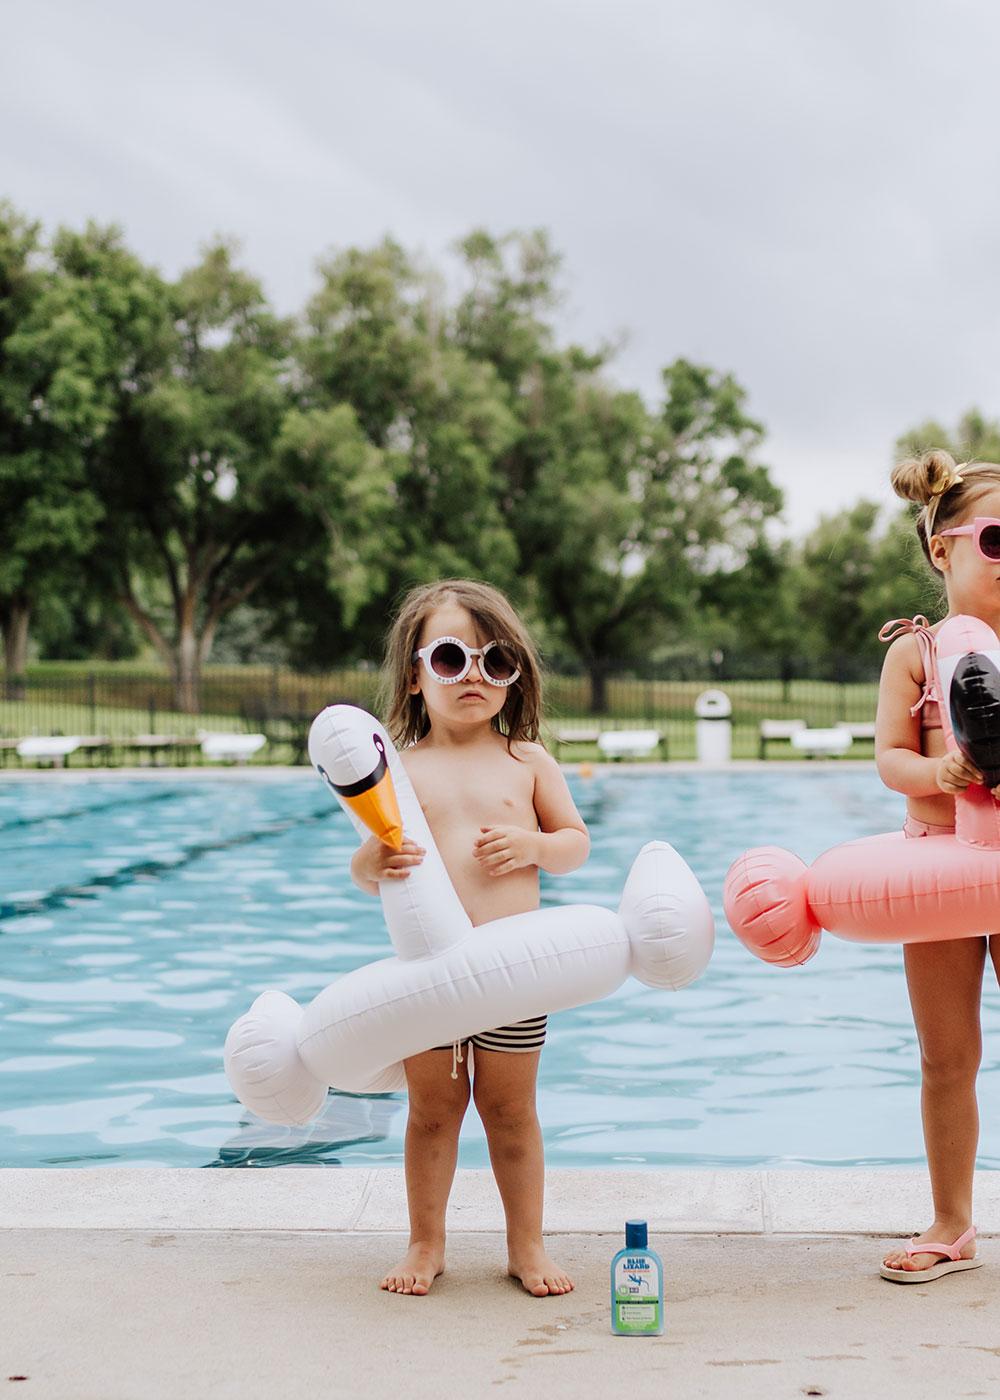 swan float, flamingo float, and Blue Lizard Australian Sunscreen   thelovedesignedlife.com